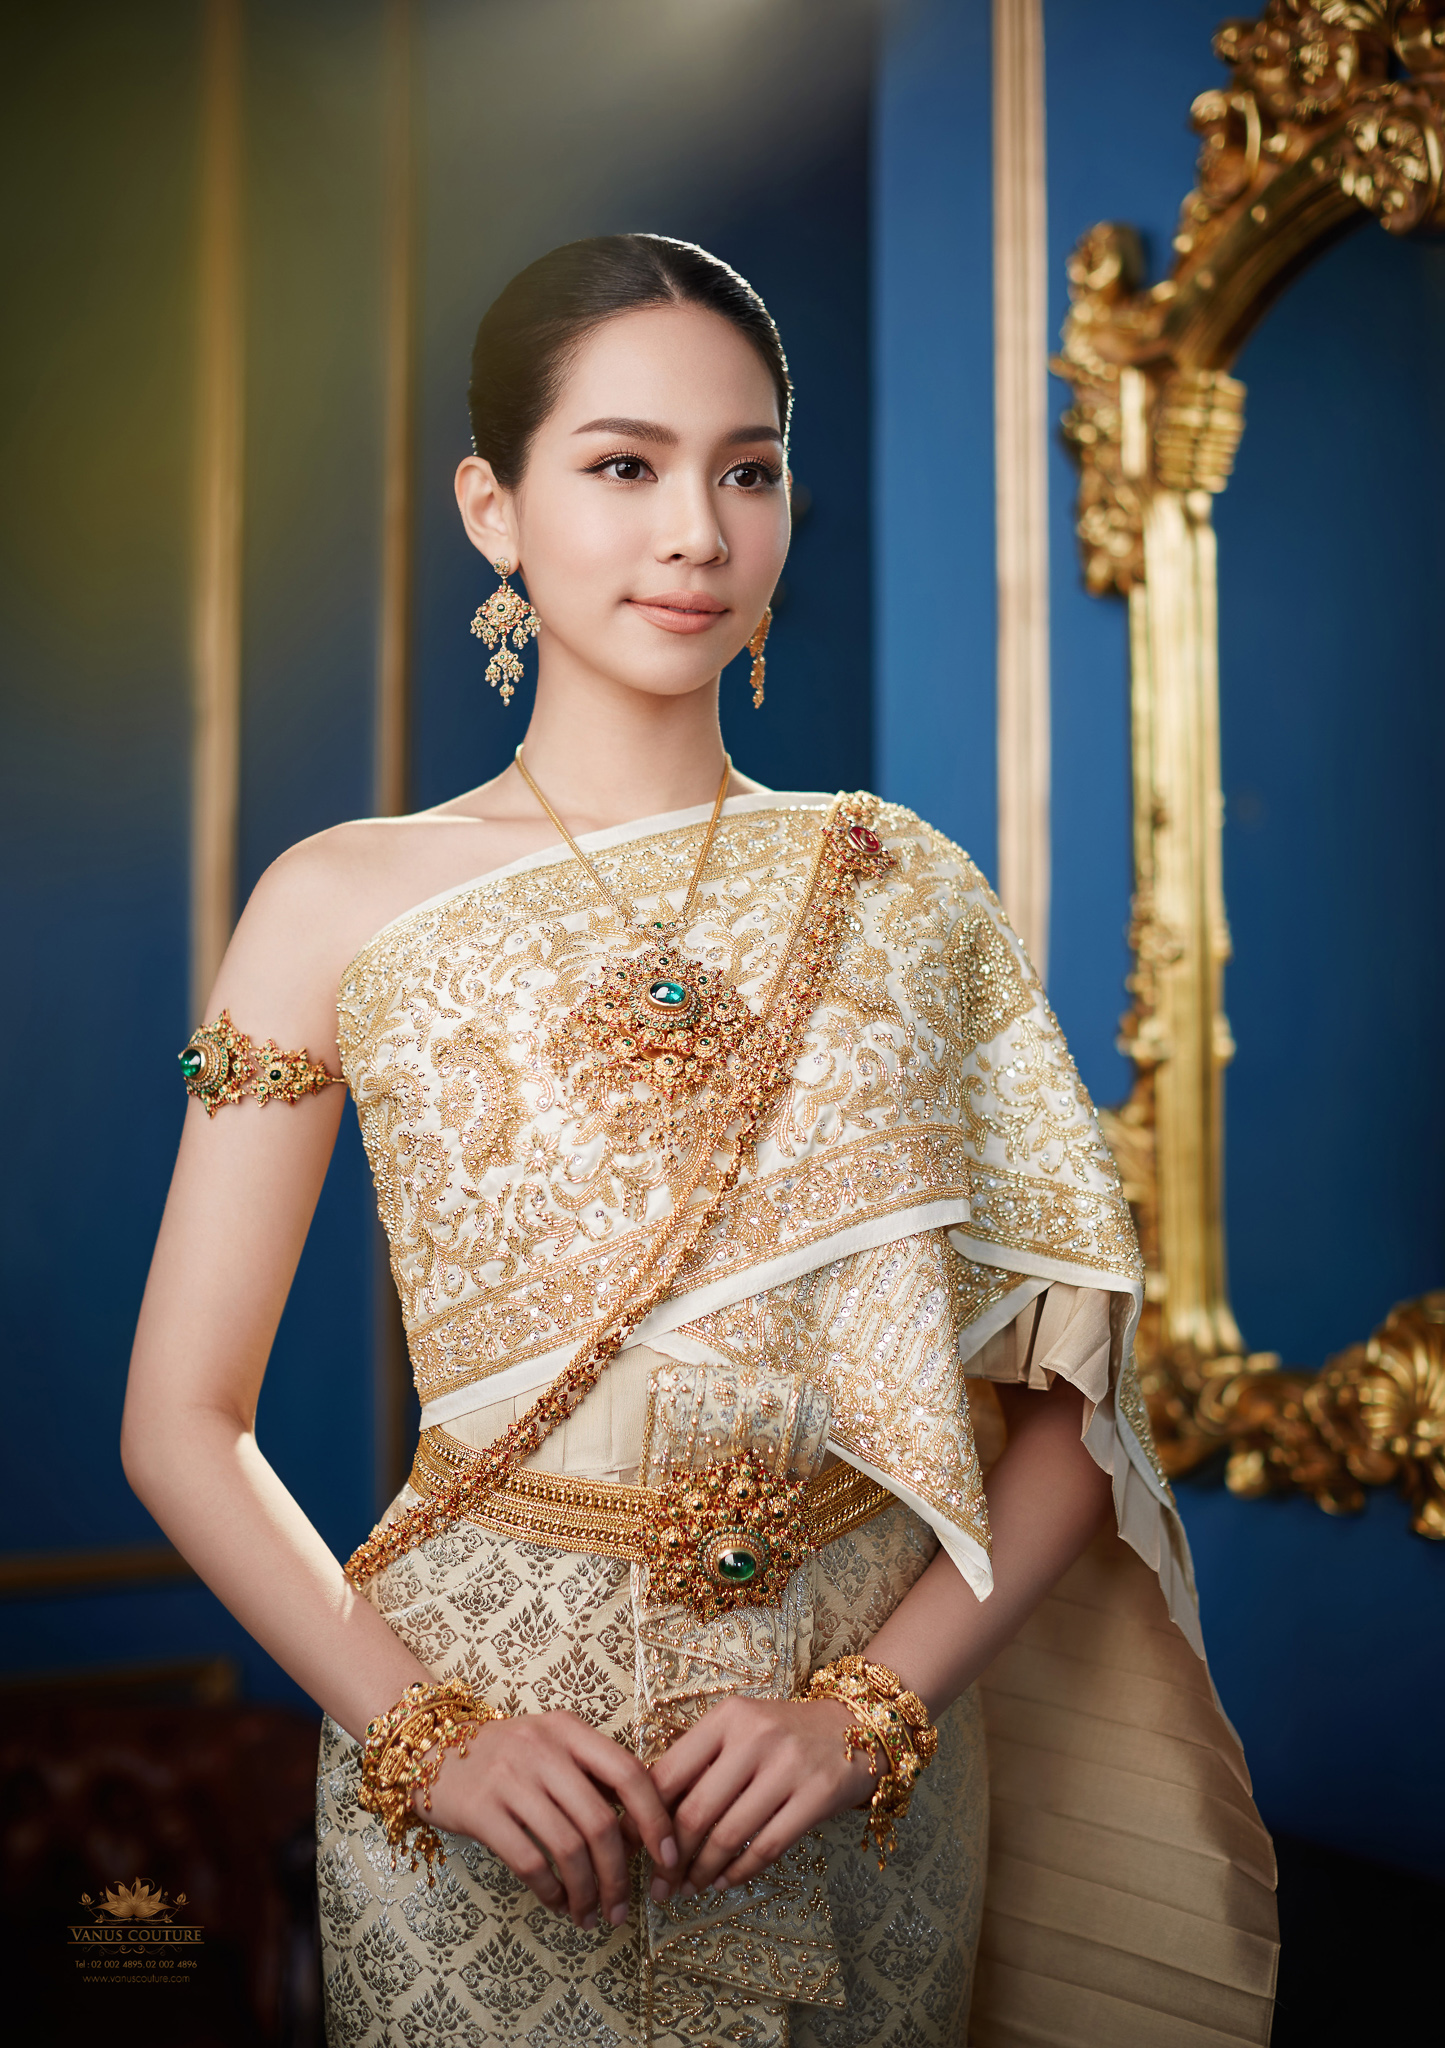 Thai traditional dress - Bint 08